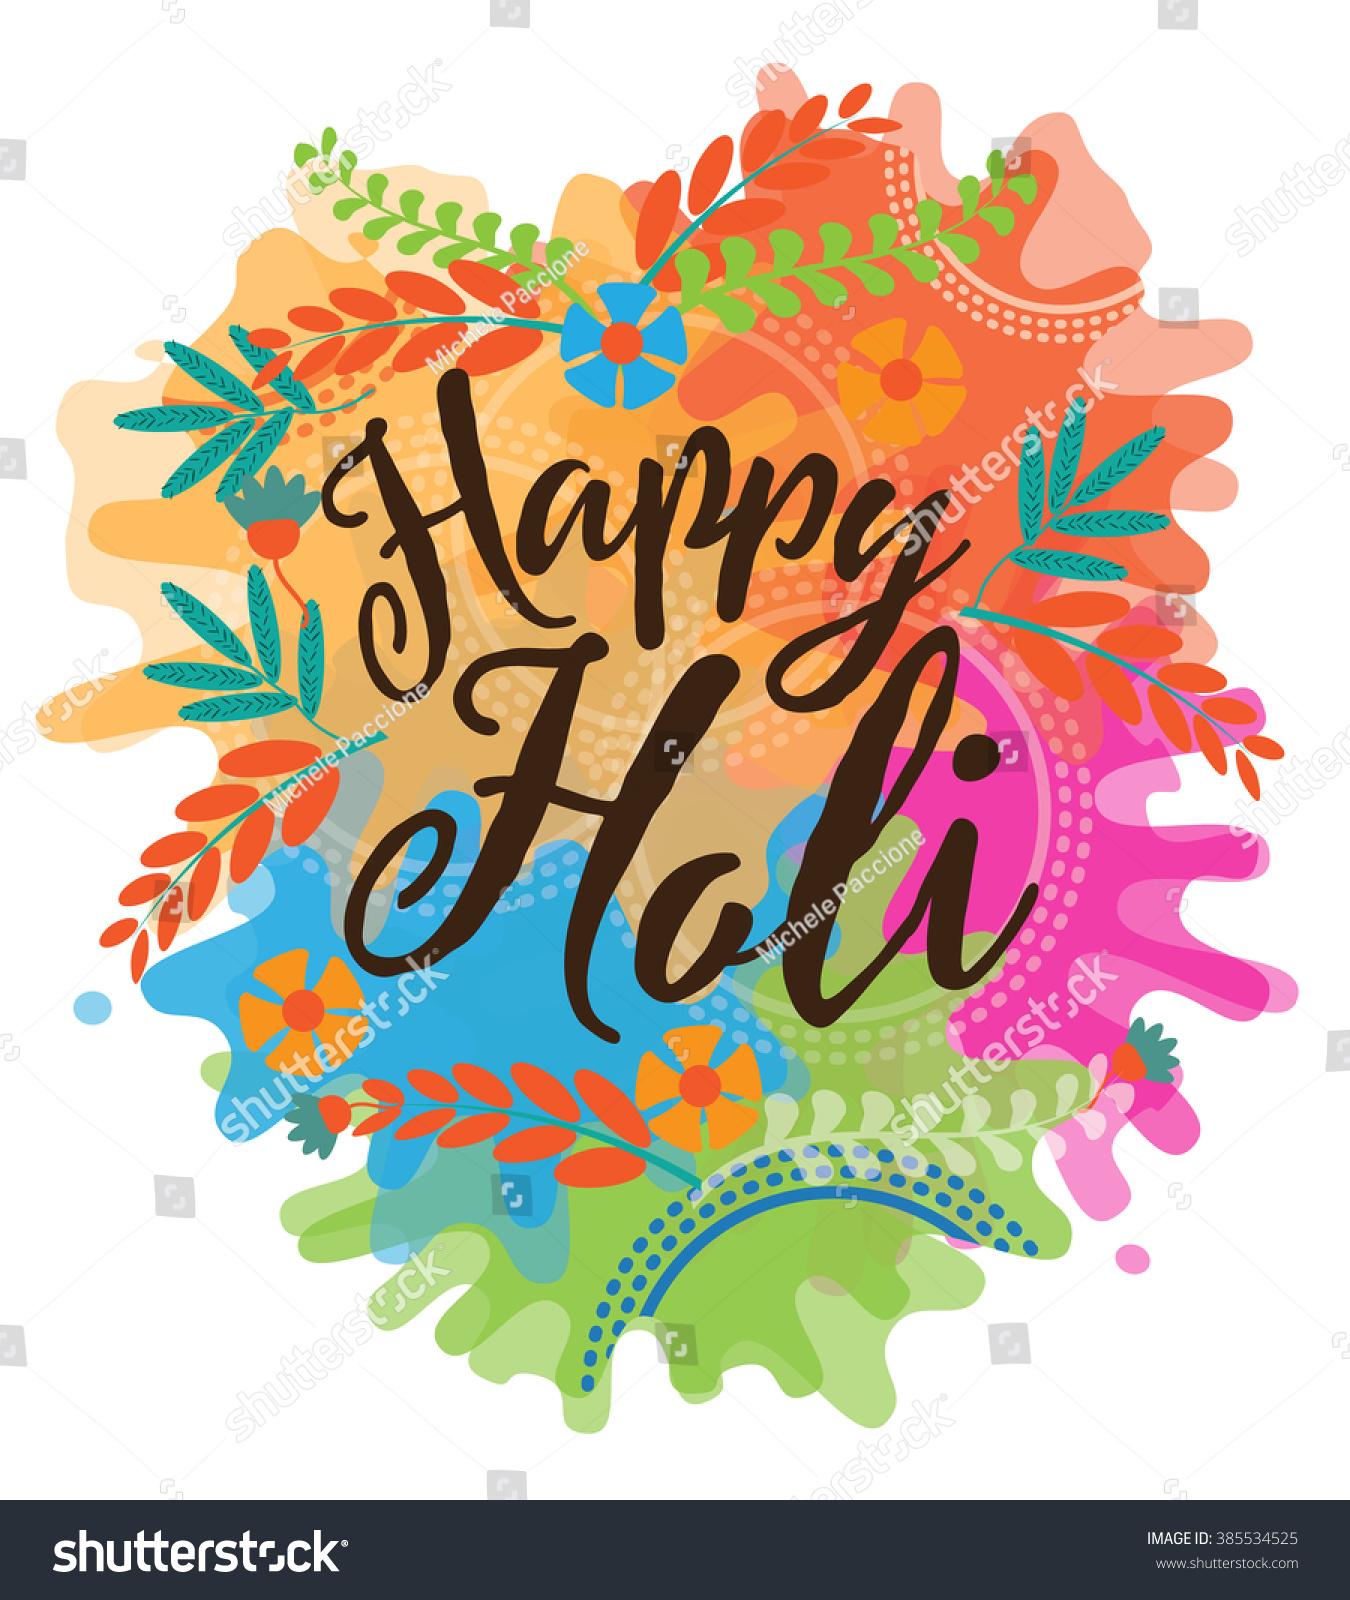 Happy holi poster greeting card design stock illustration 385534525 happy holi poster greeting card design m4hsunfo